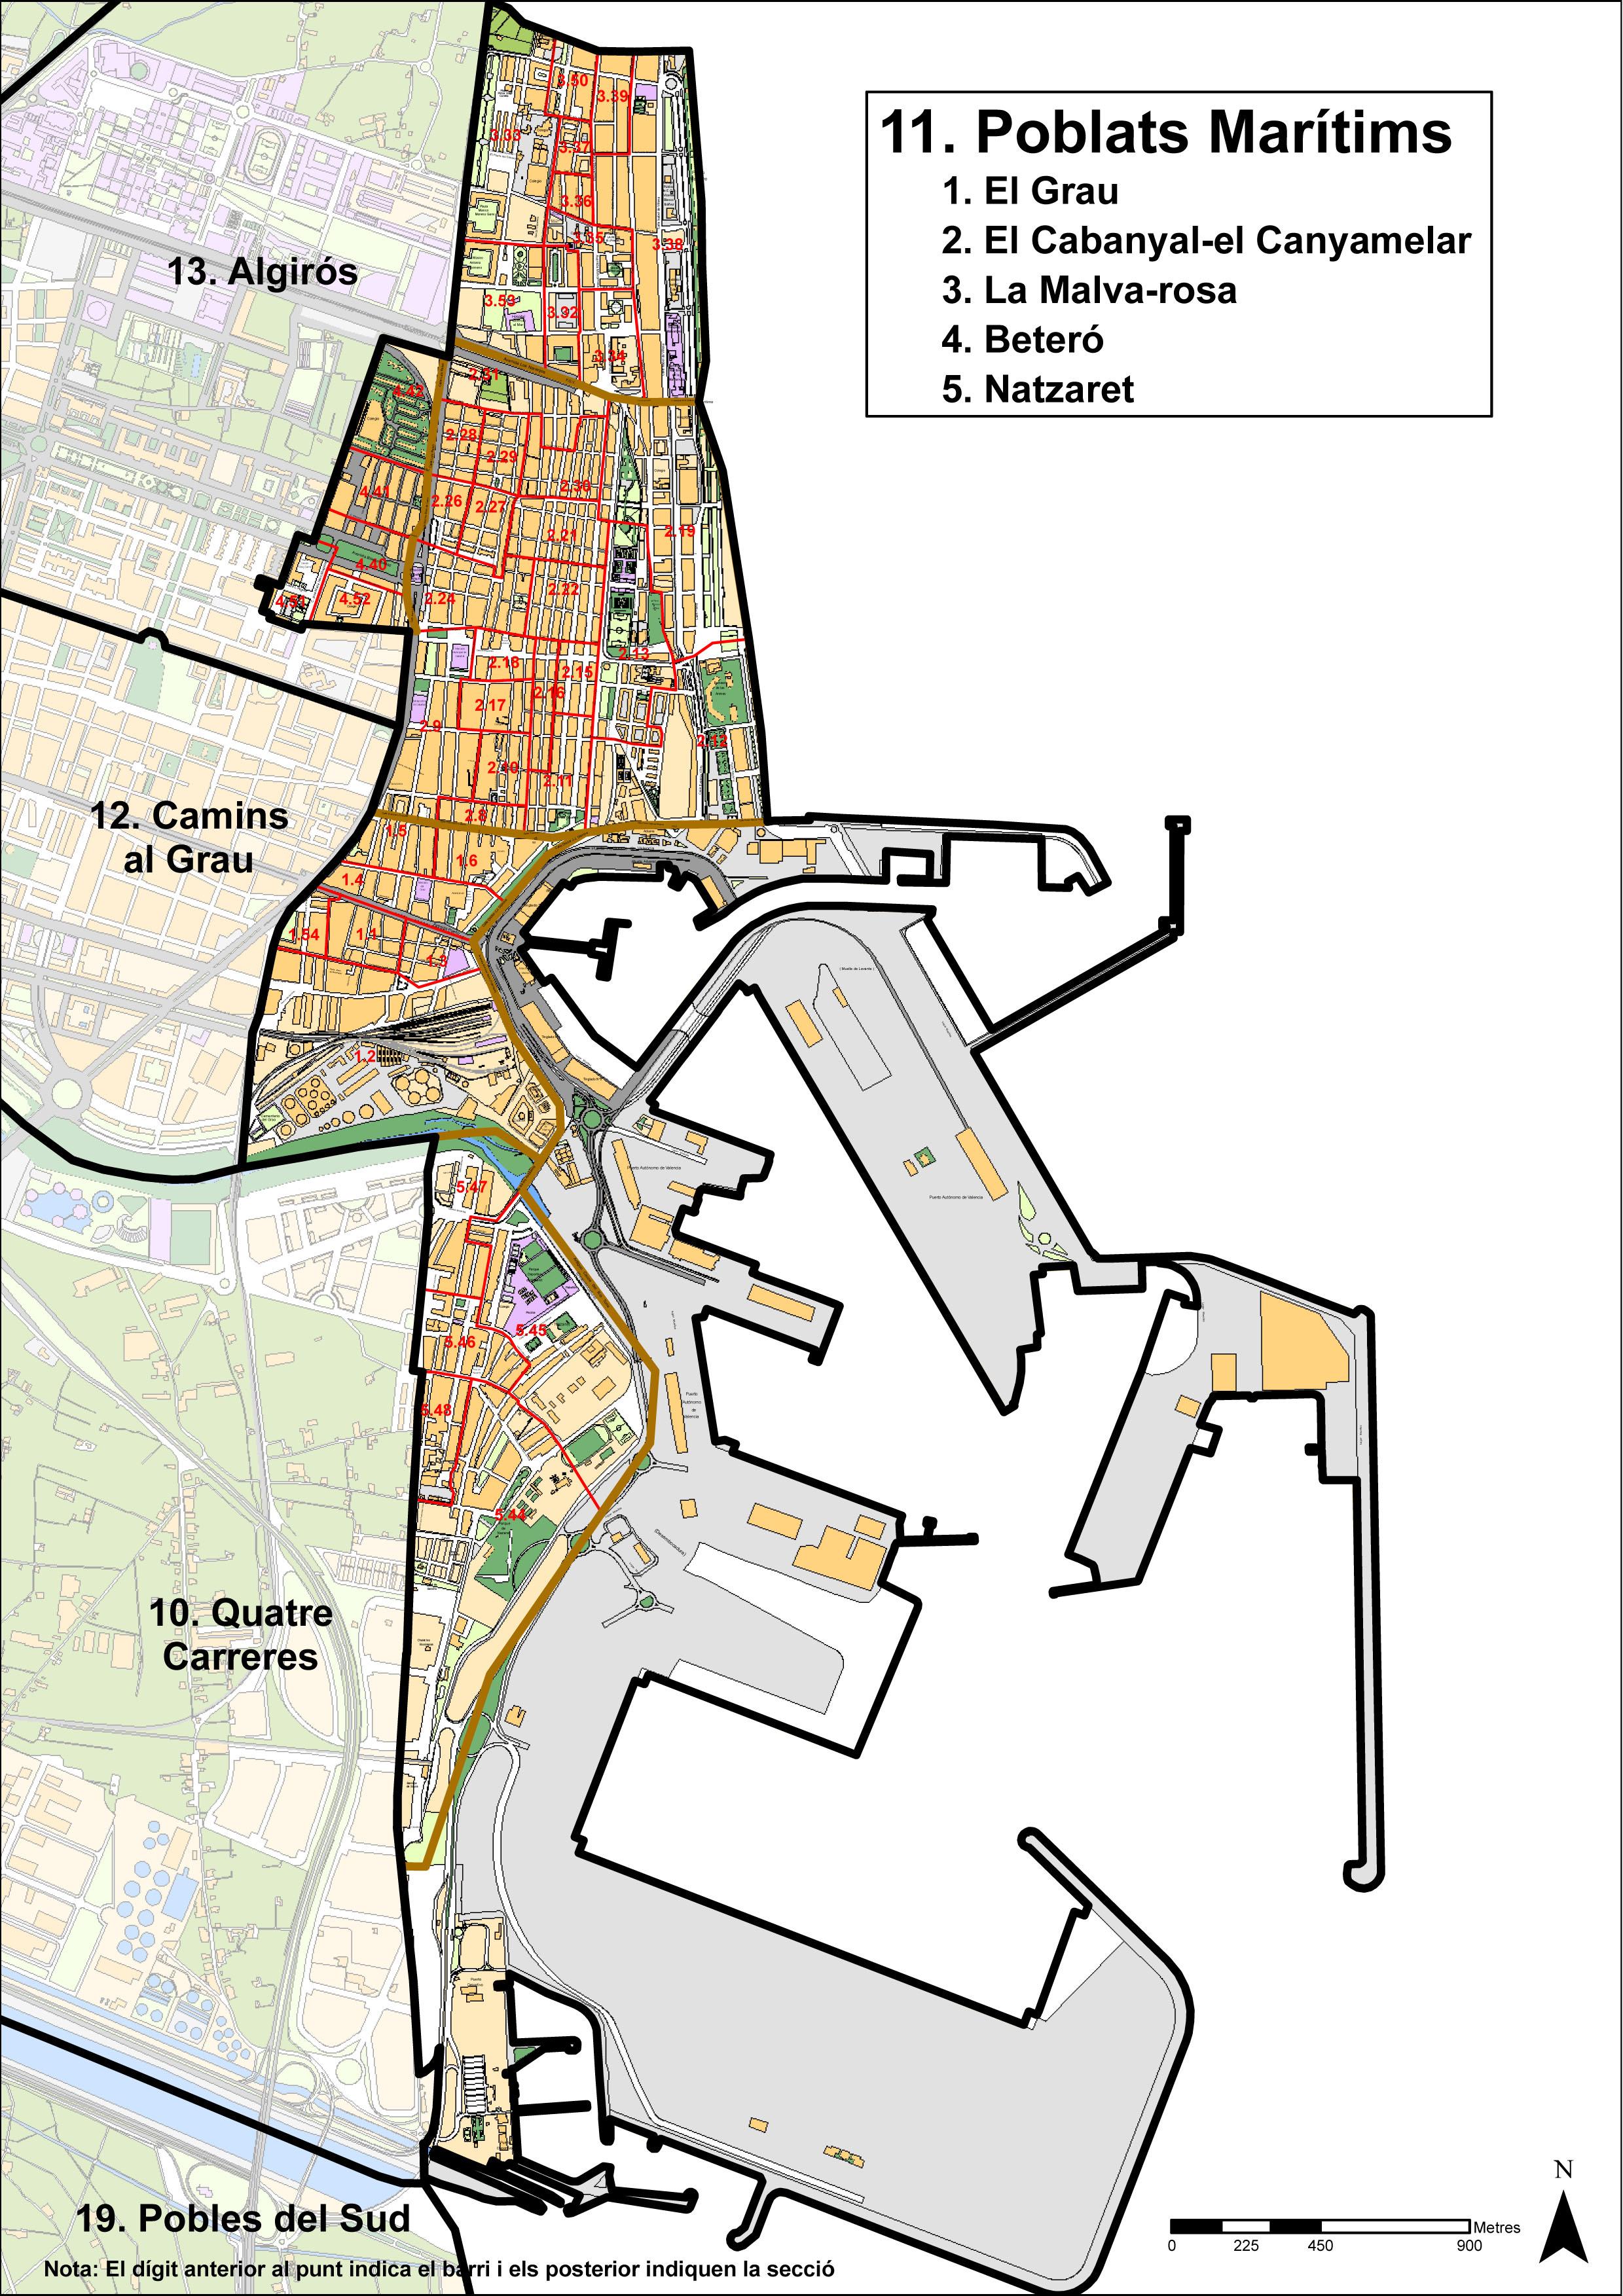 Poblats Marítims districts, Valencia